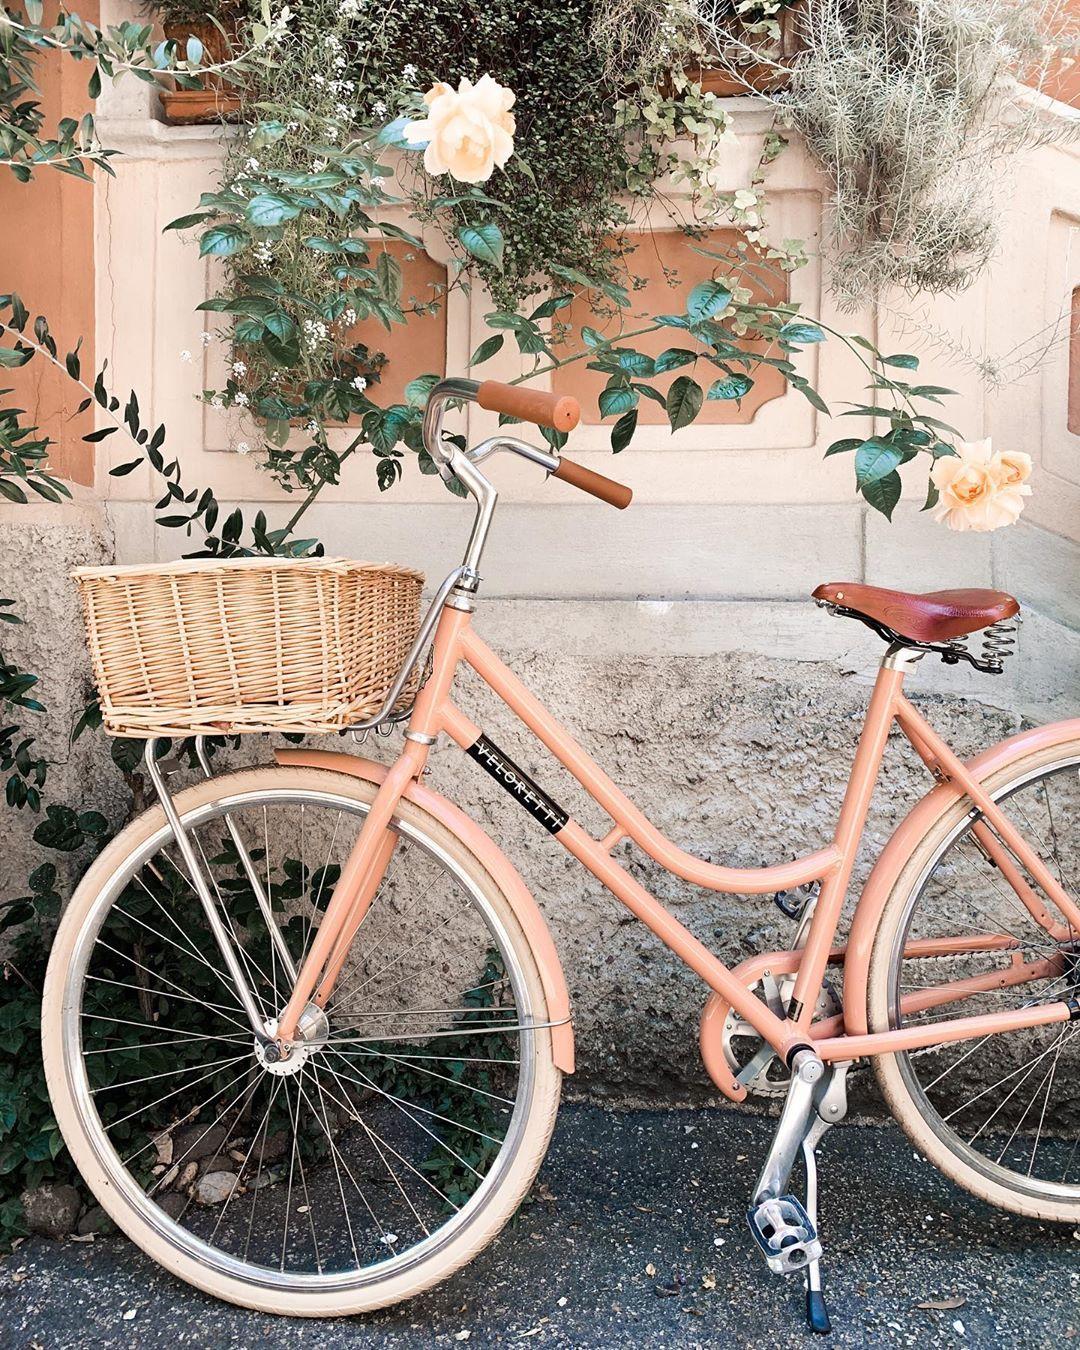 Joe On Instagram The Dutch Girl Veloretti In 2020 Dutch Bike Bicycle Photography Vintage Bikes